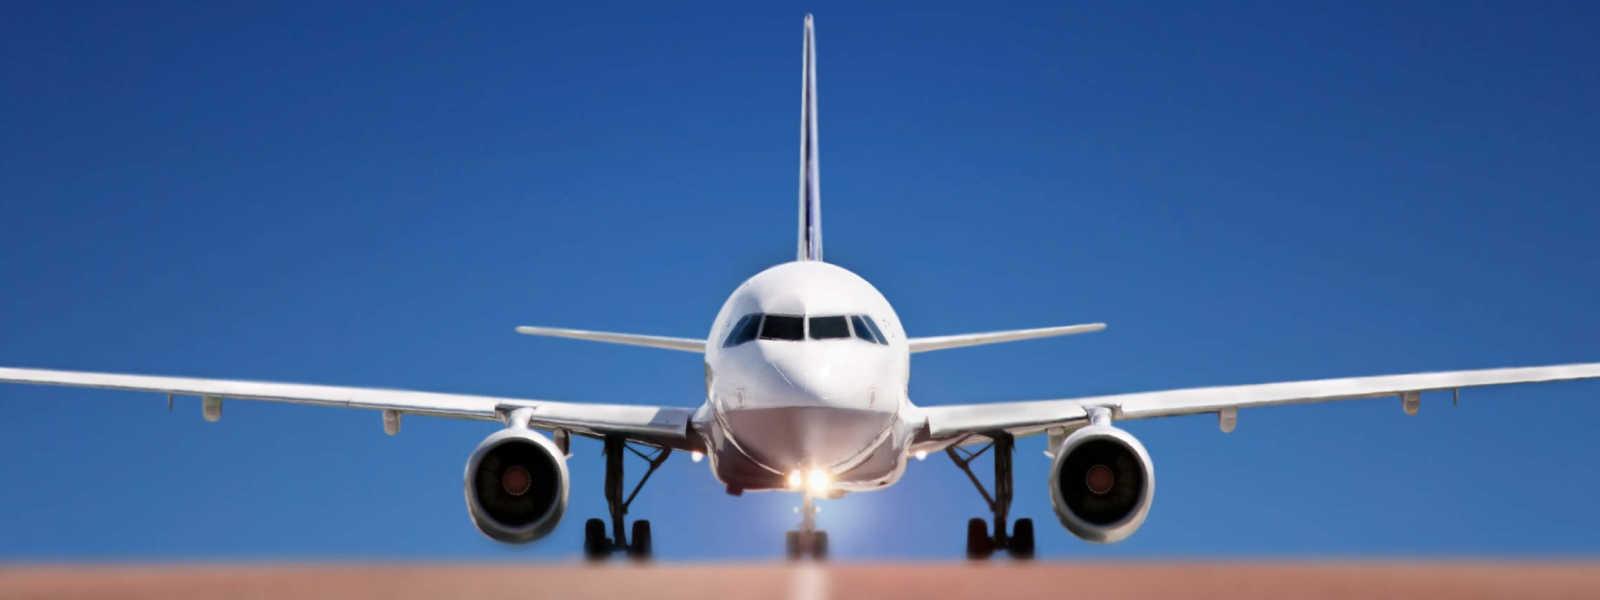 Самолёт, дешовые авиабилеты